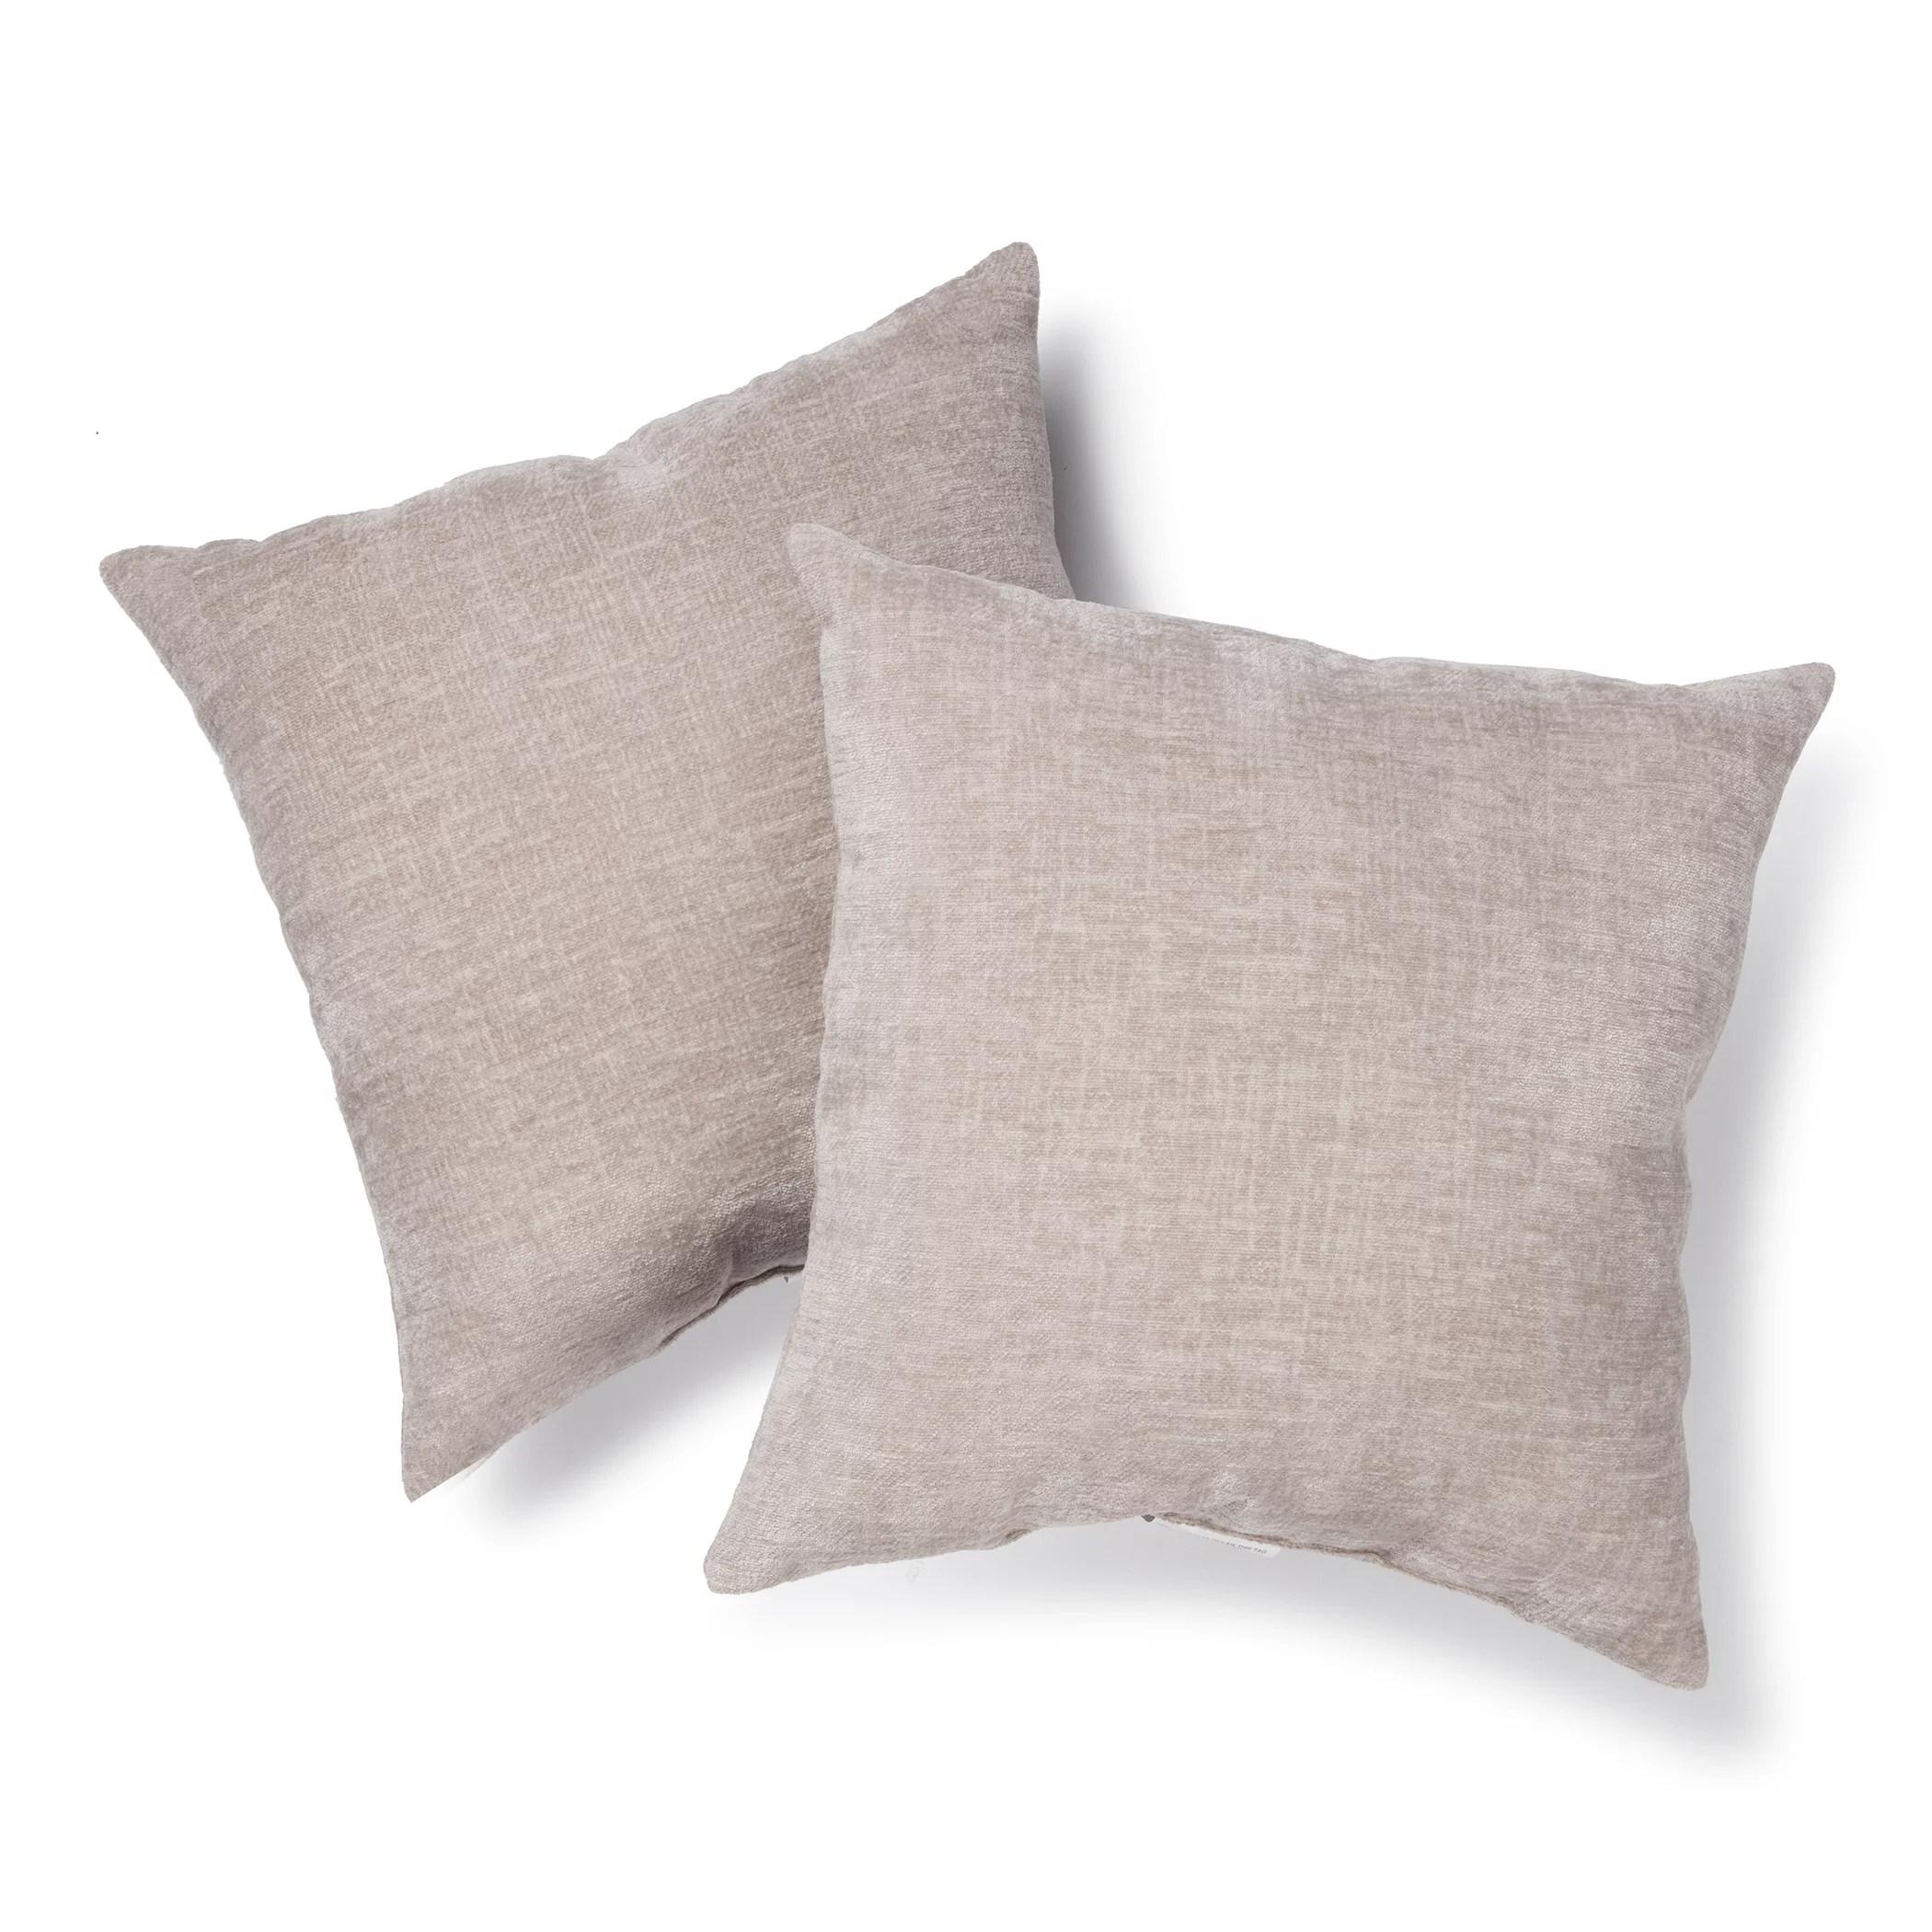 mainstays chenille decorative throw pillow 18 x 18 aqua ocean two pack